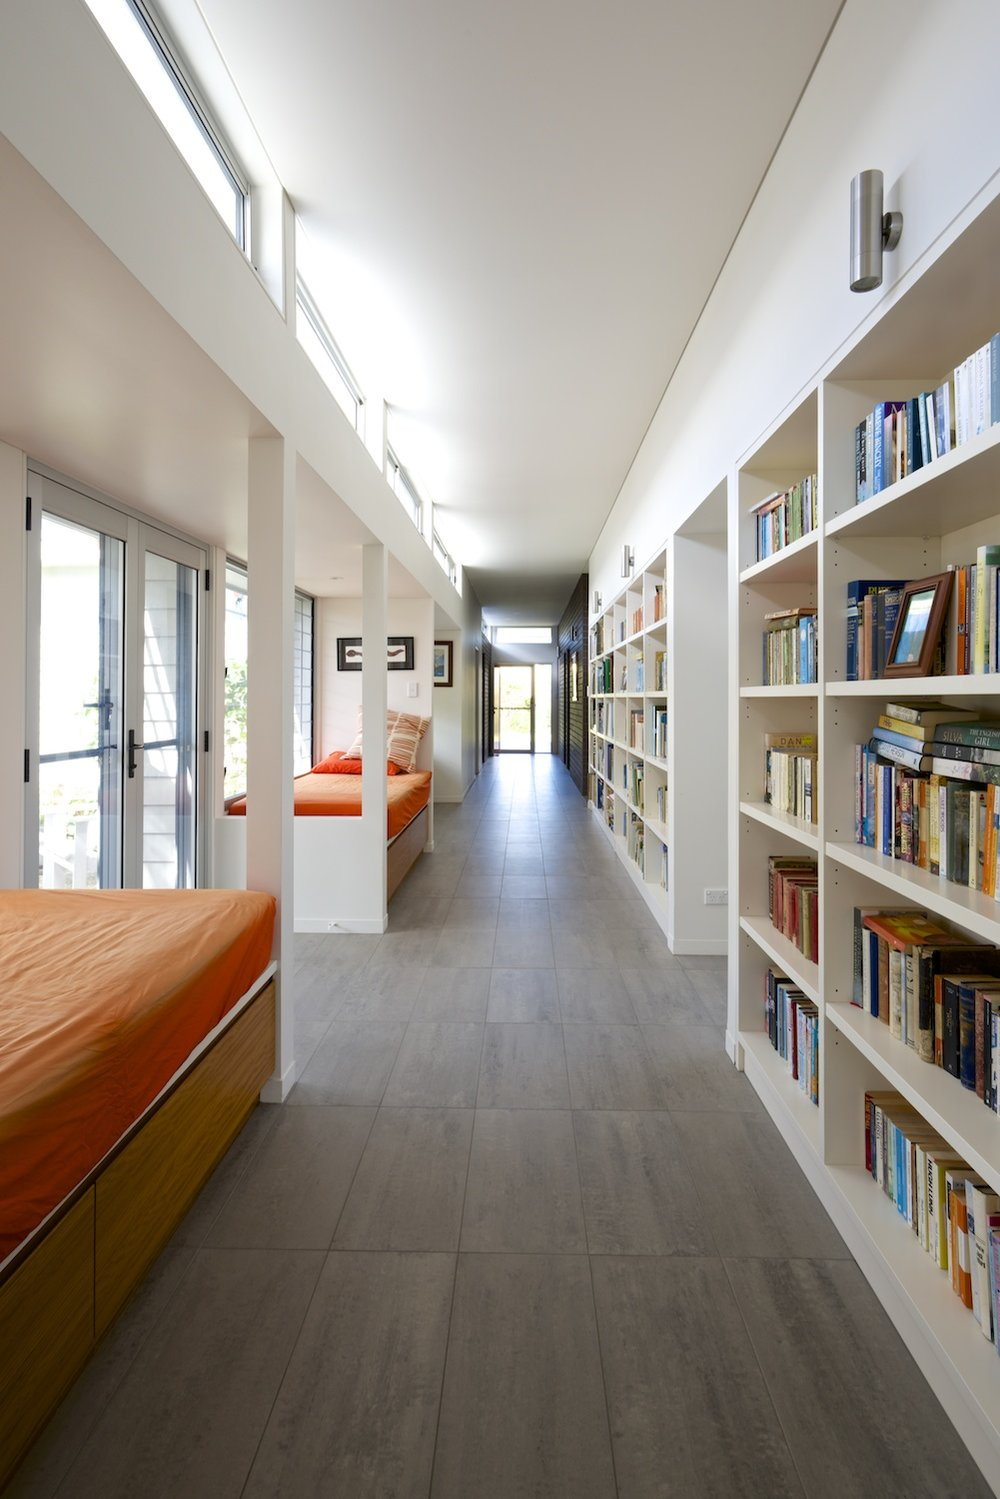 9corridortoeast.jpg